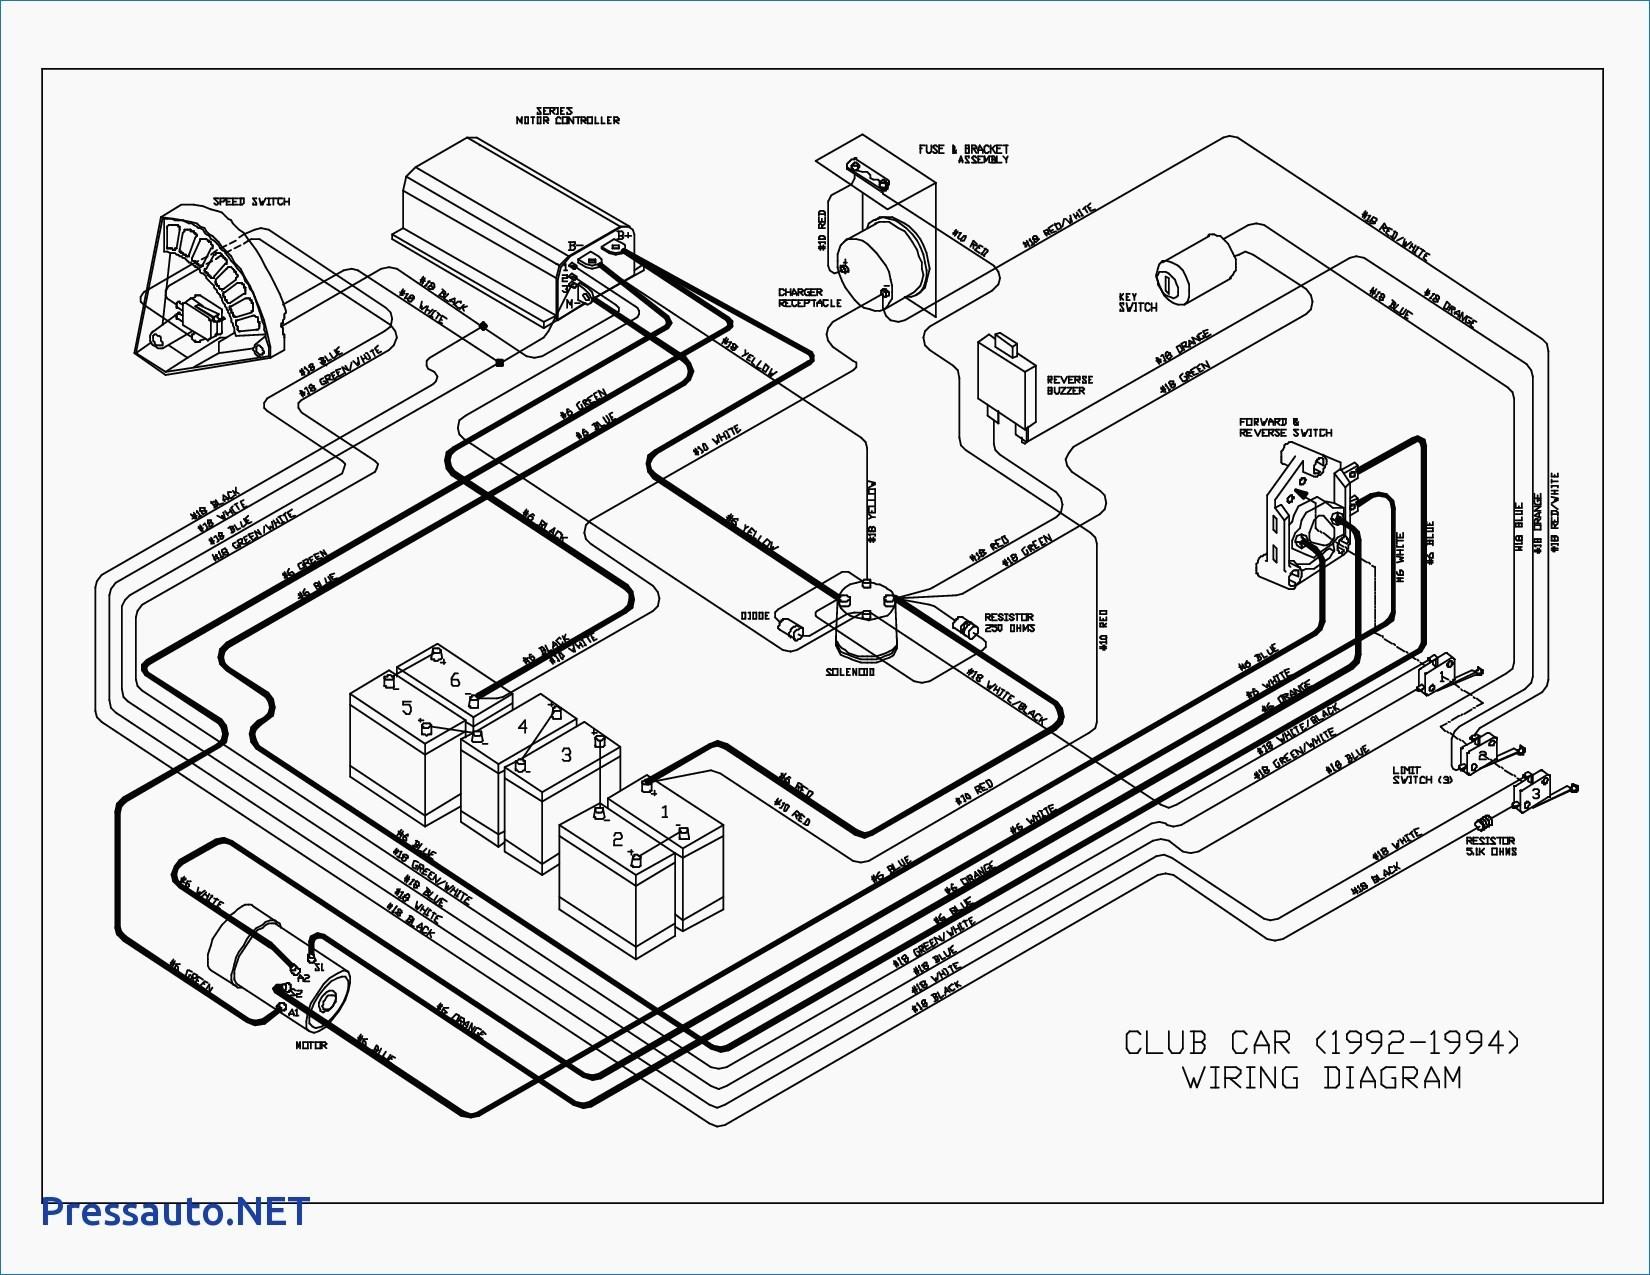 1987 club car electrical schematic wiring diagram today review electrical circuit wiring diagram club car ds